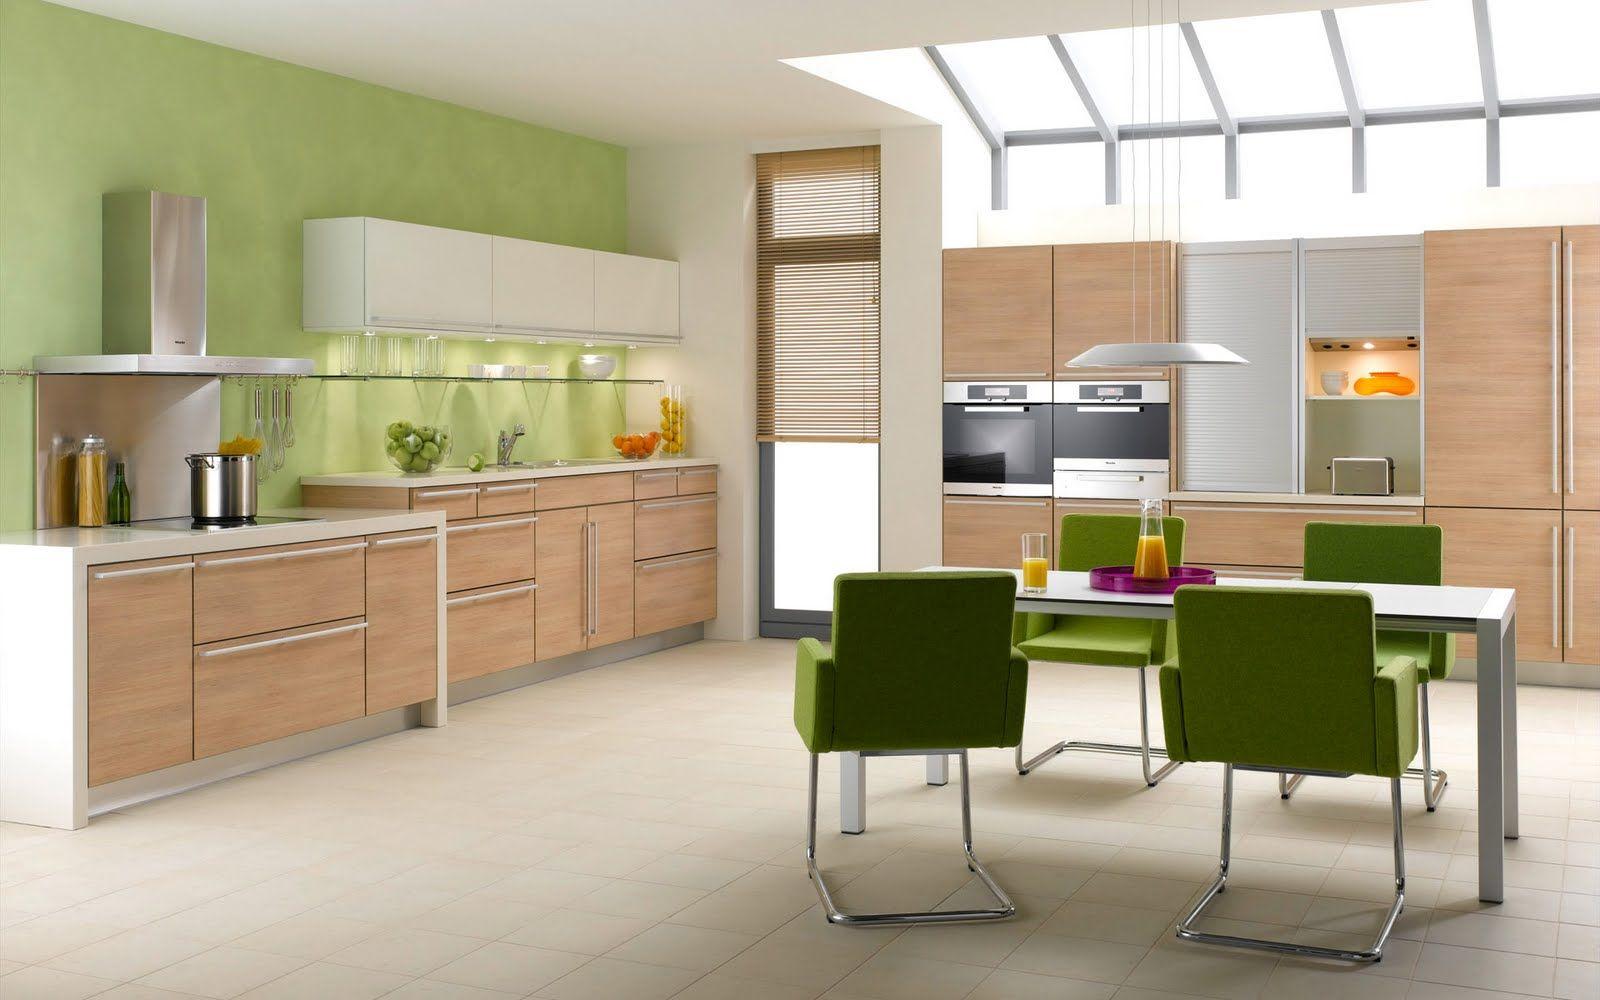 Pitturare Mobili Cucina